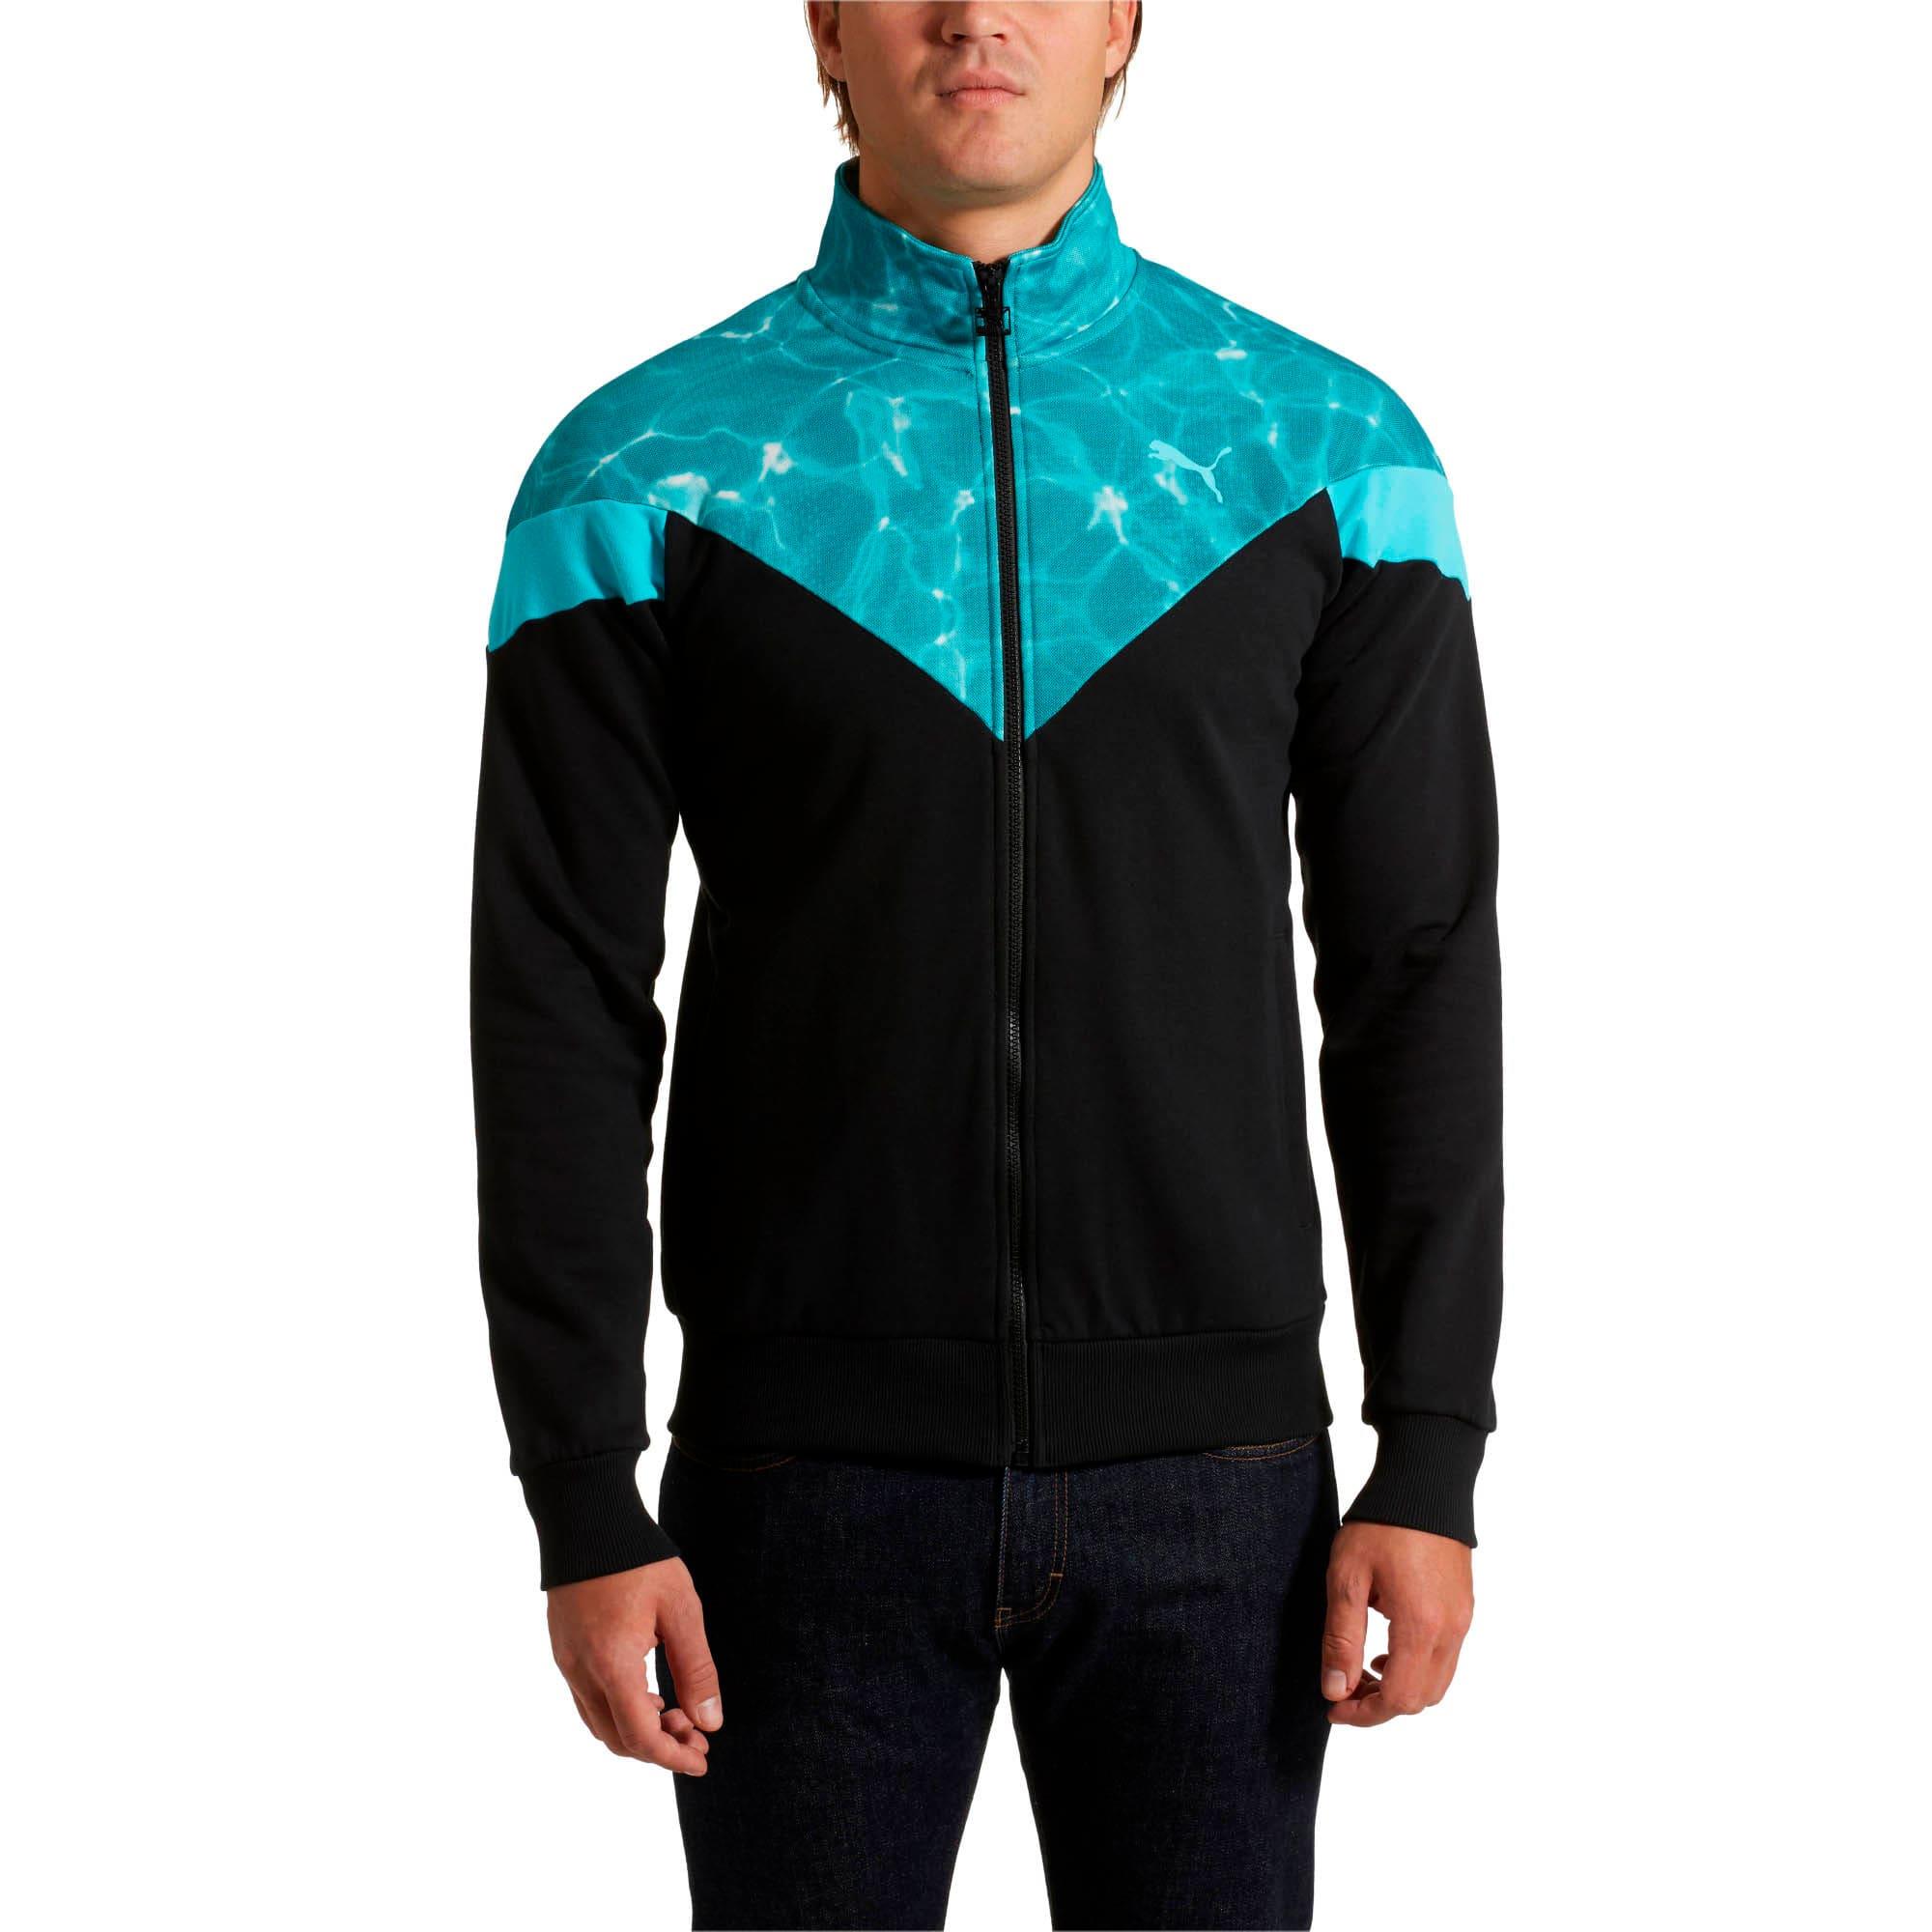 Thumbnail 2 of MCS Pool Men's Track Jacket, Puma Black, medium